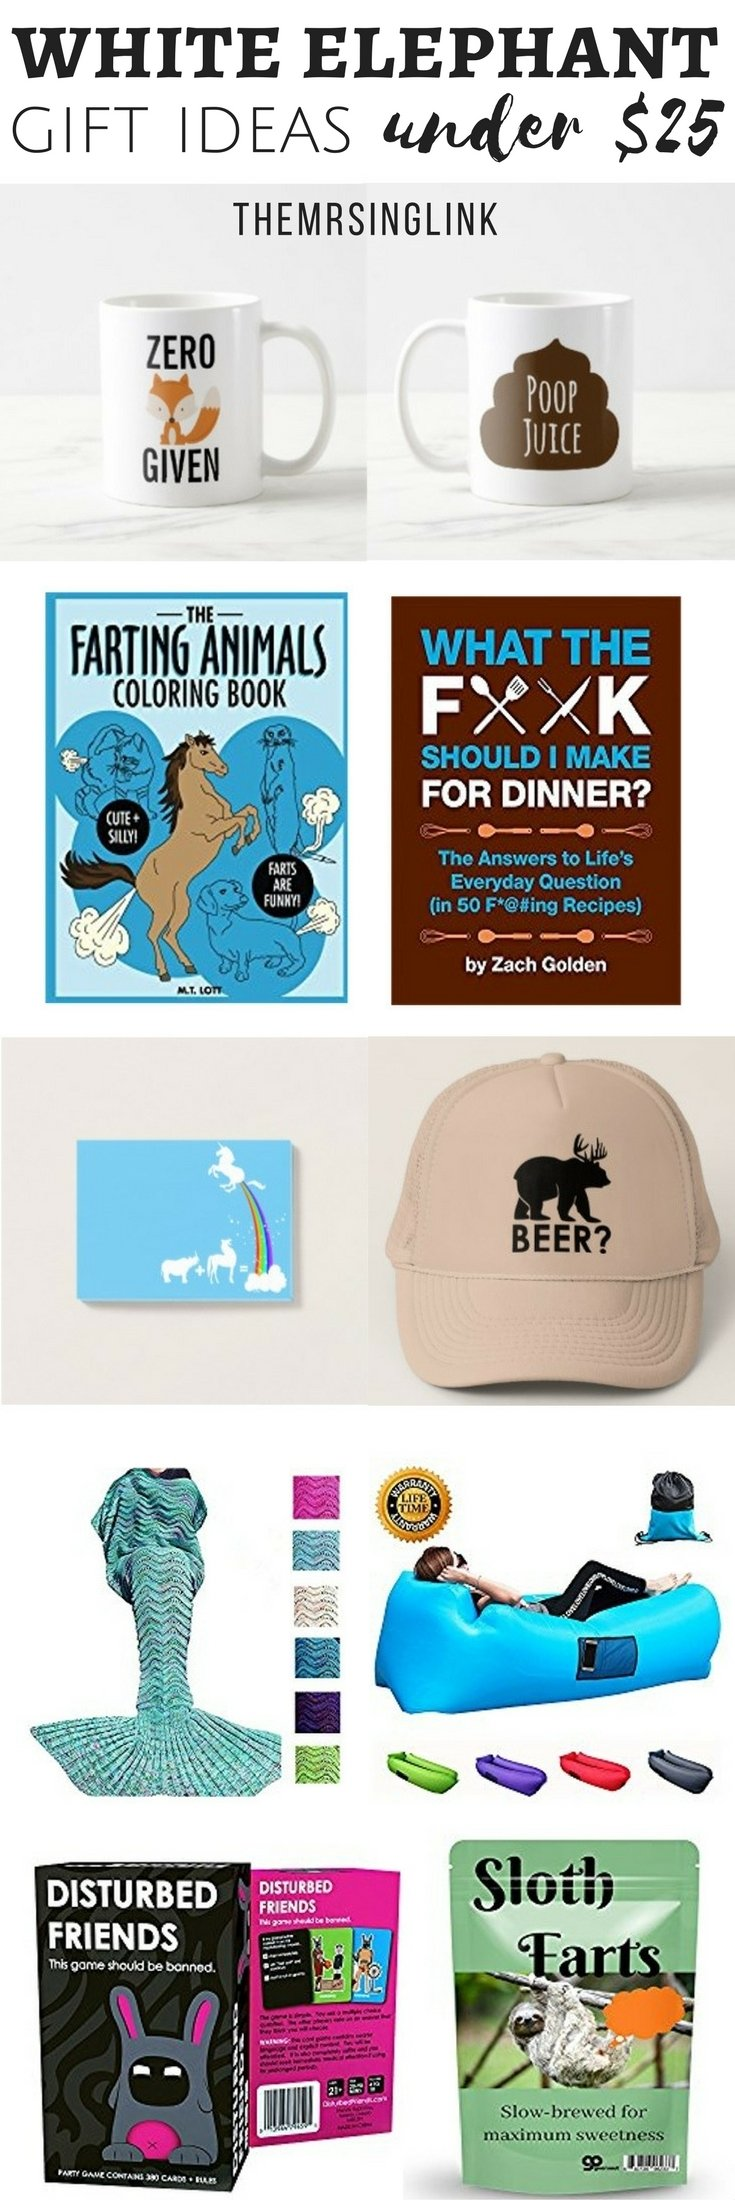 10 Famous Christmas White Elephant Gift Ideas 15 hilarious gags gift ideas for your white elephant christmas party 2021